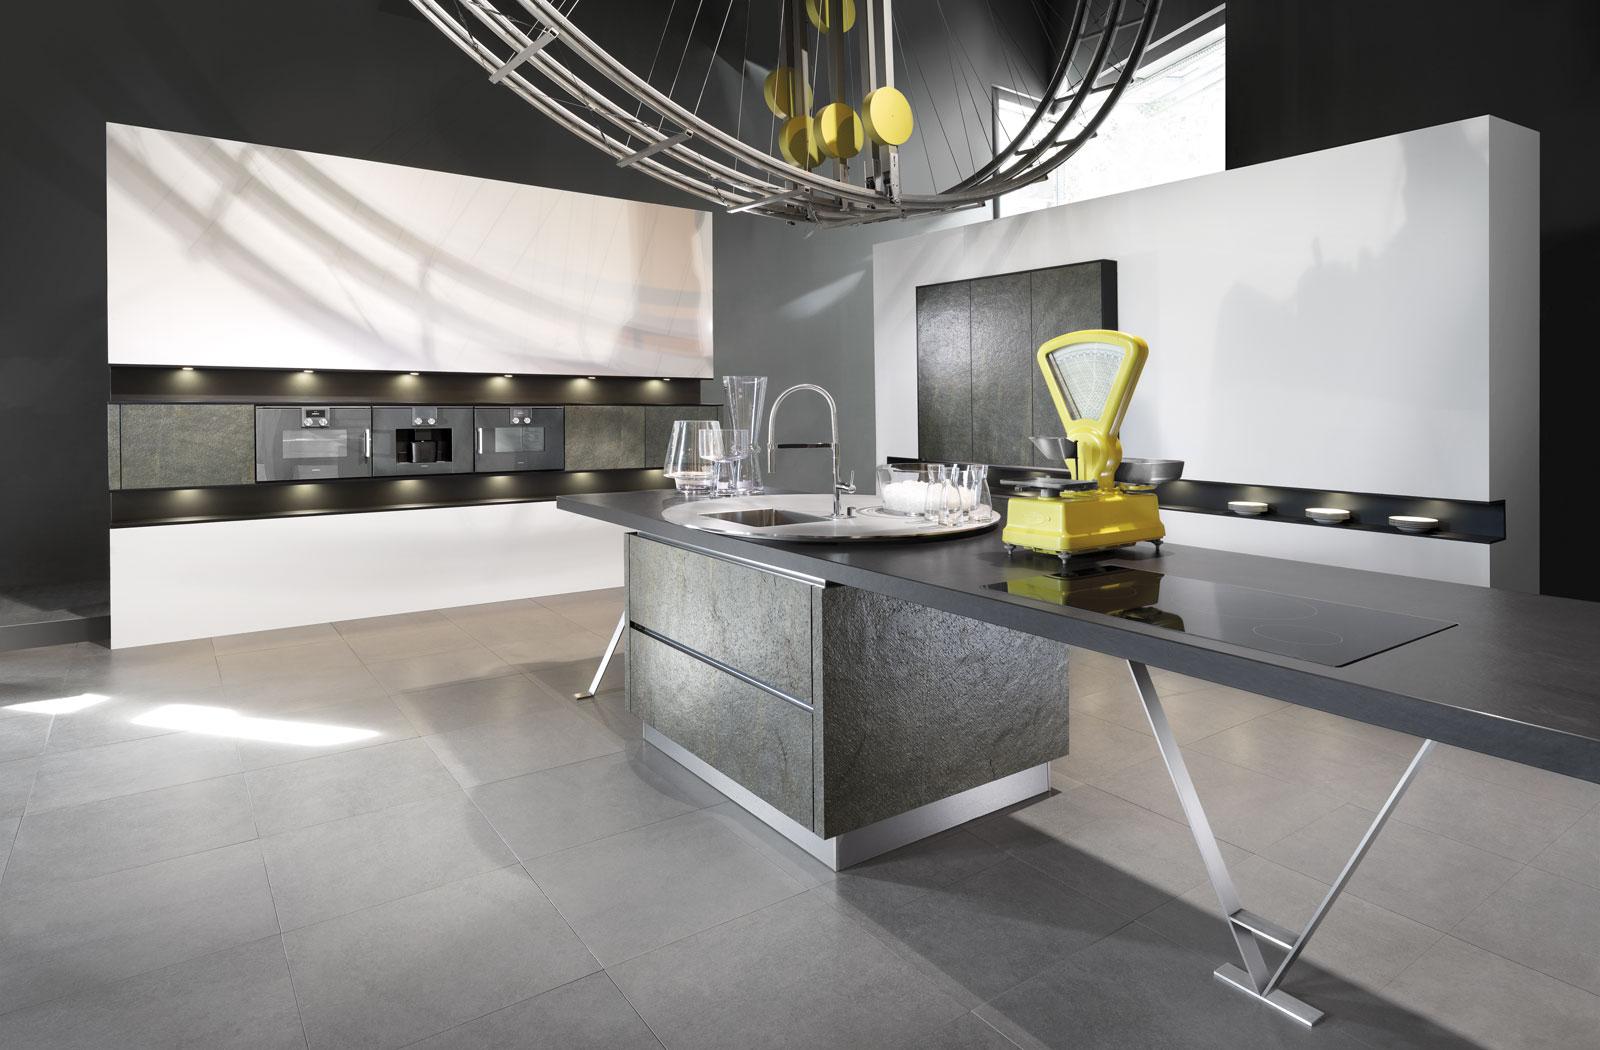 stunning grimm k chen karlsruhe gallery house design ideas. Black Bedroom Furniture Sets. Home Design Ideas